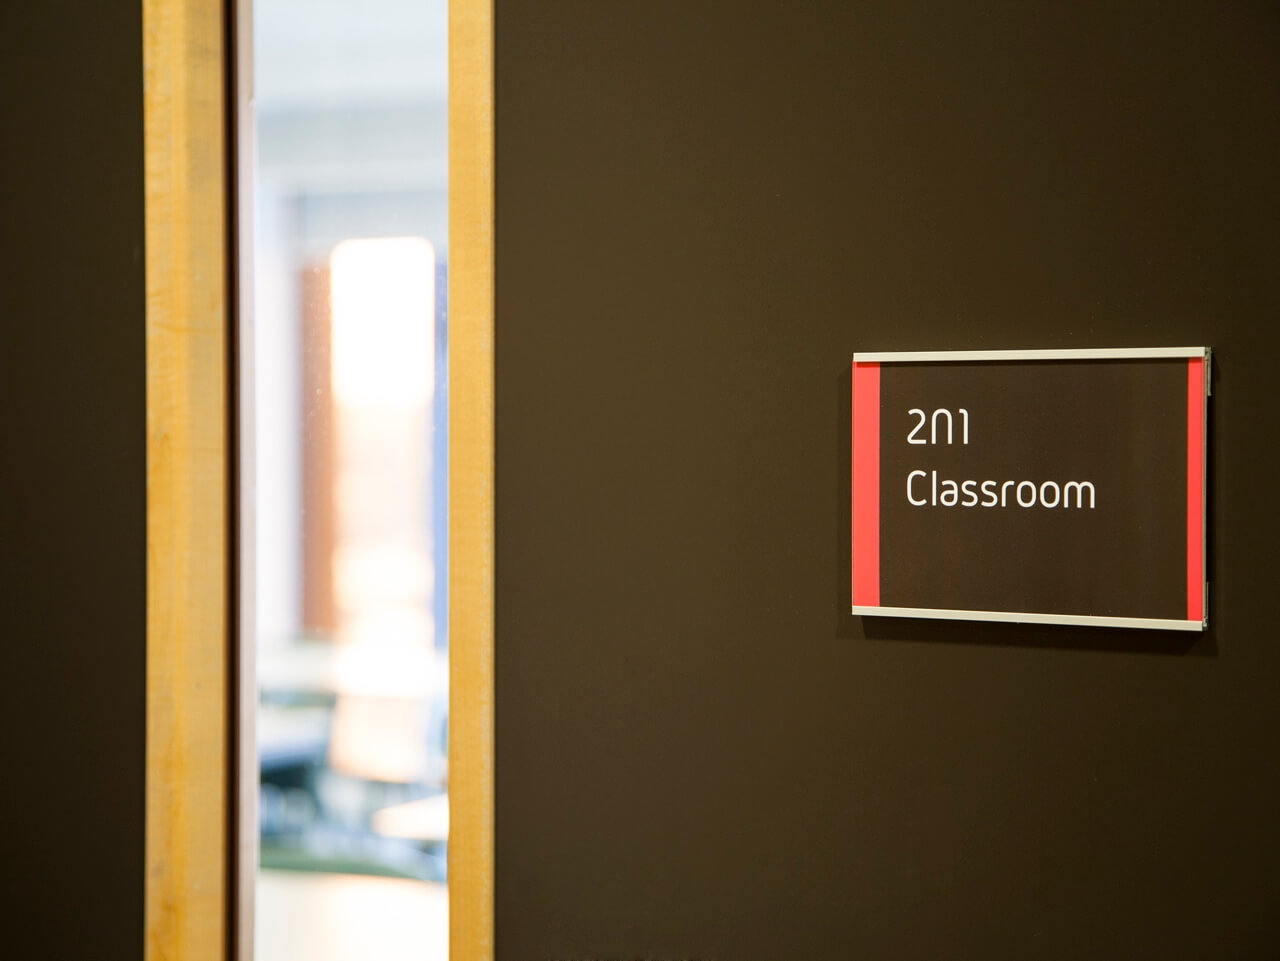 Classroom door signage